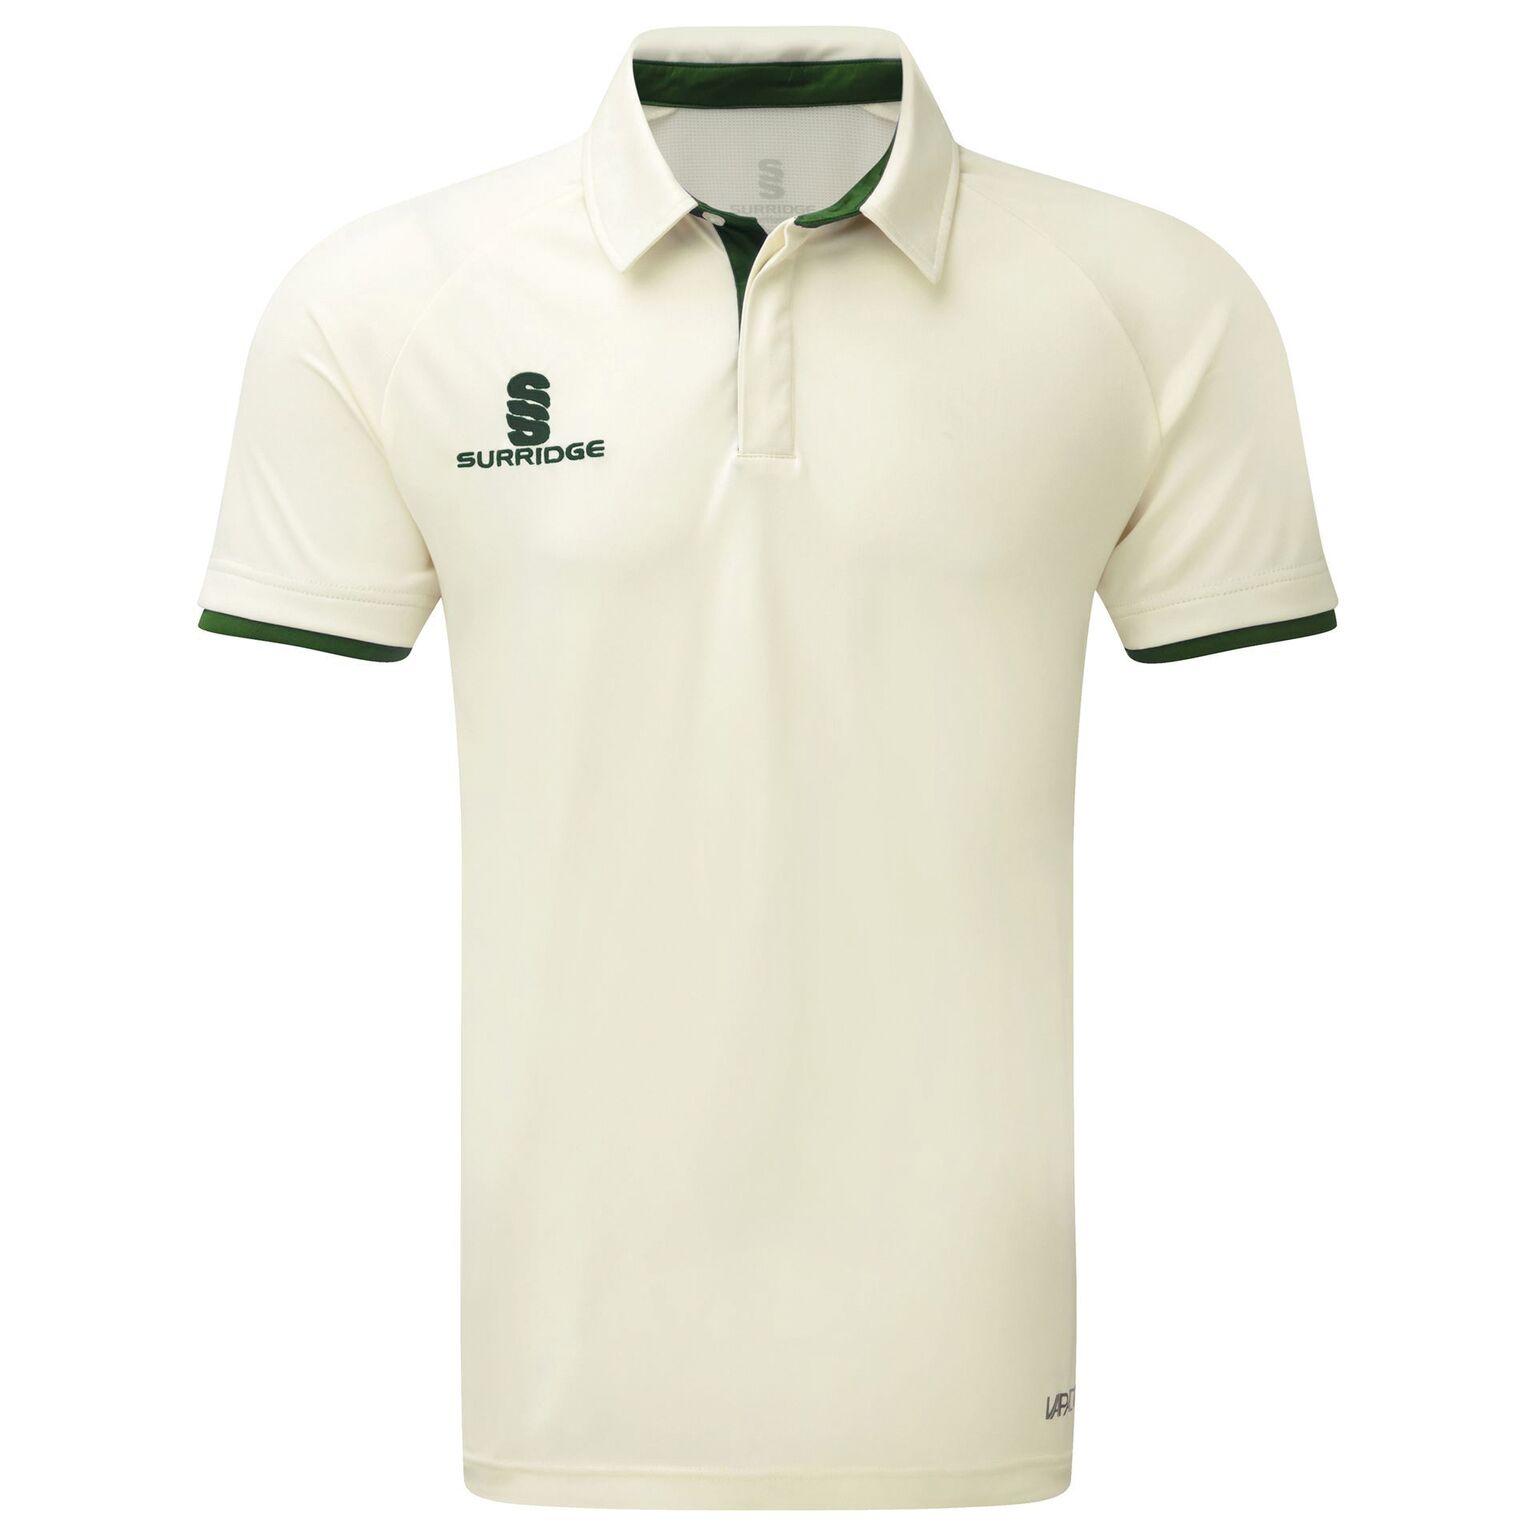 Surridge Mens Ergo Short Sleeve Shirt (M) (White/Green Trim)